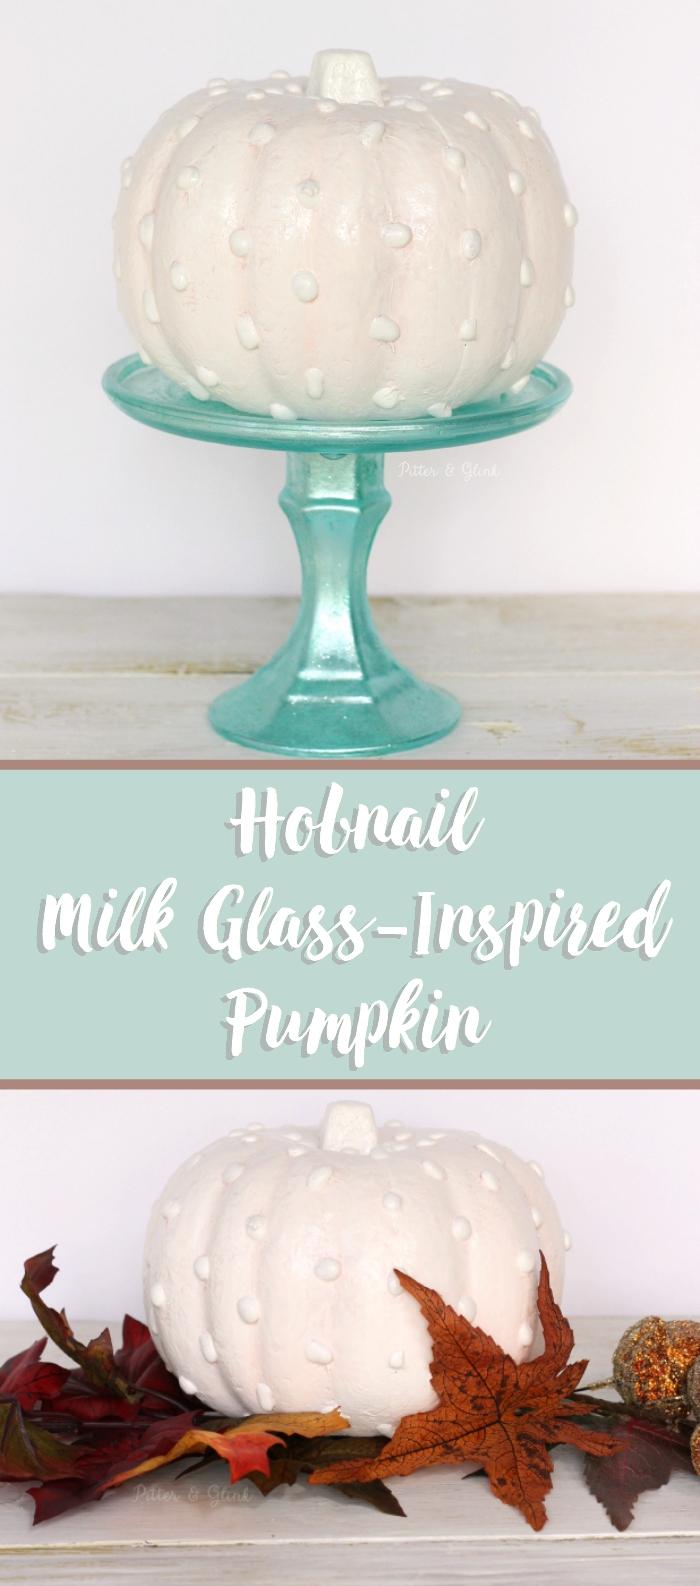 Hobnail Milk Glass-Inspired Dollar Store Pumpkin Makeover www.pitterandglink.com